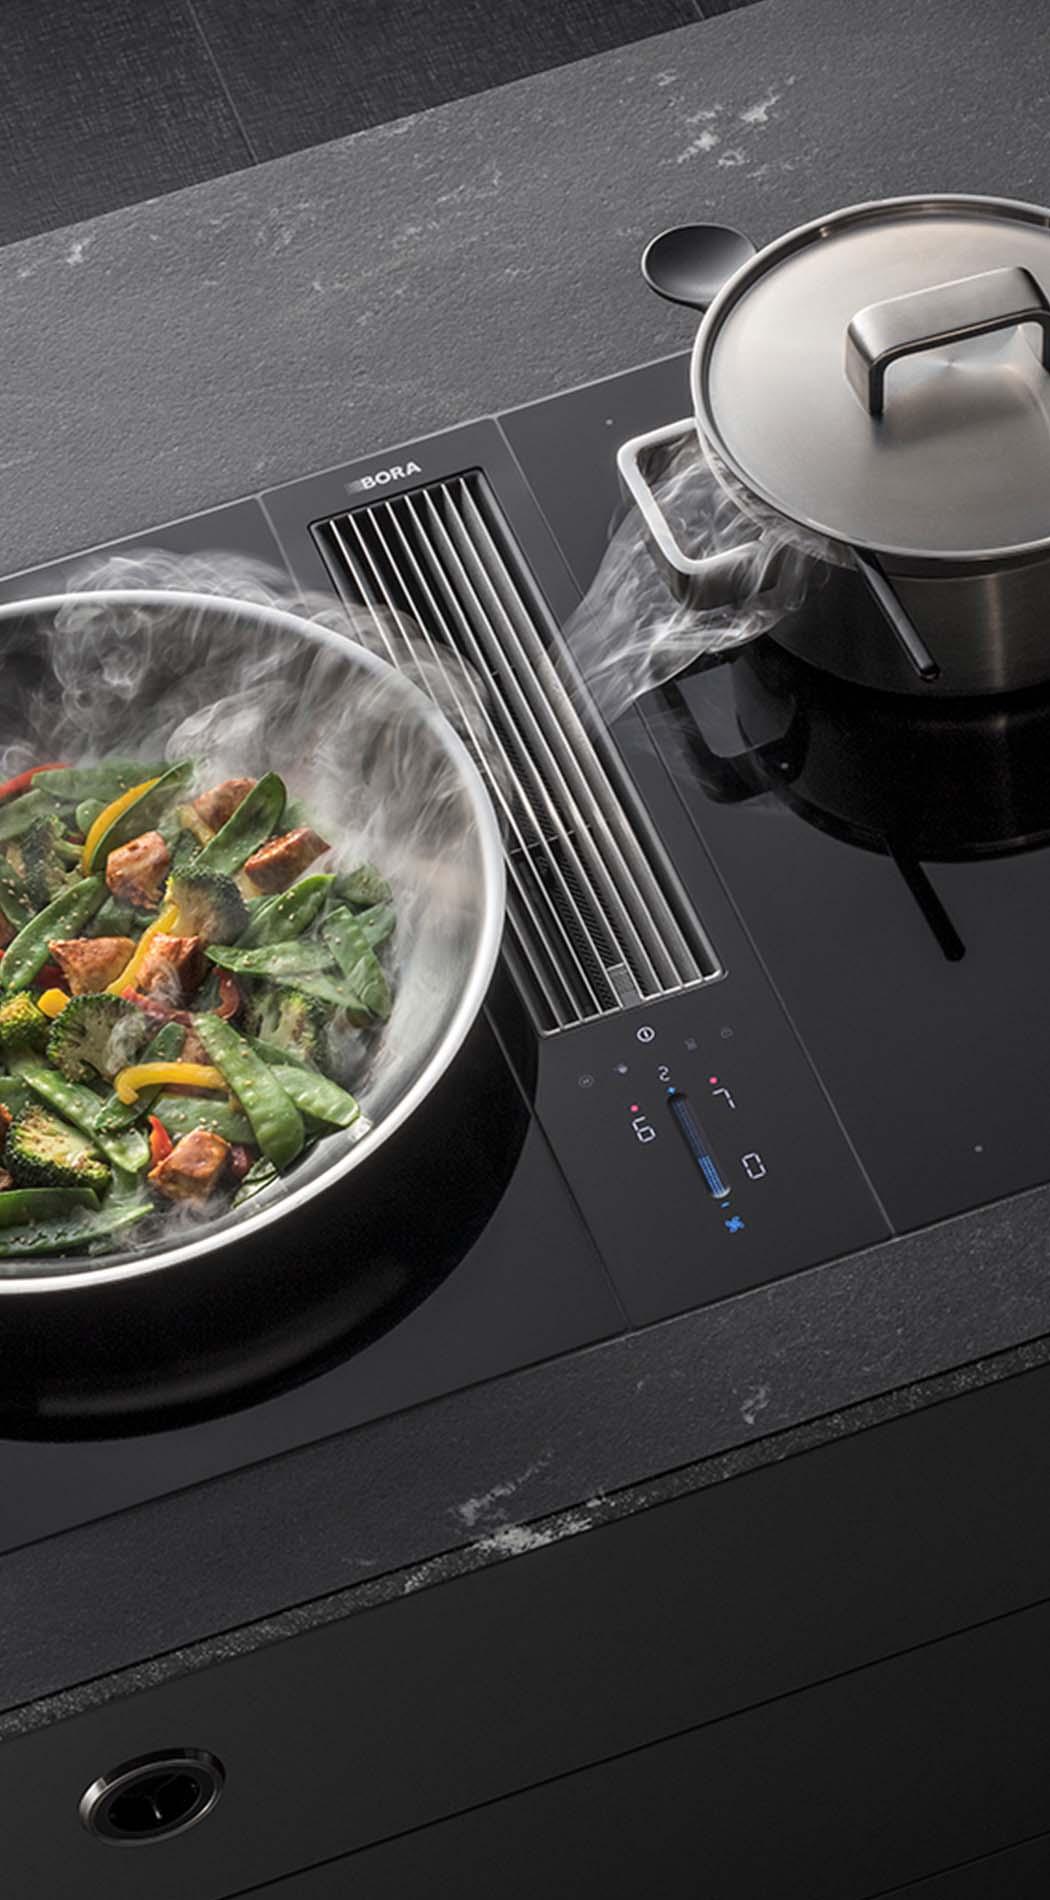 BORA Classic, BORA Kookplaat met Afzuiging, ASWA Keukens